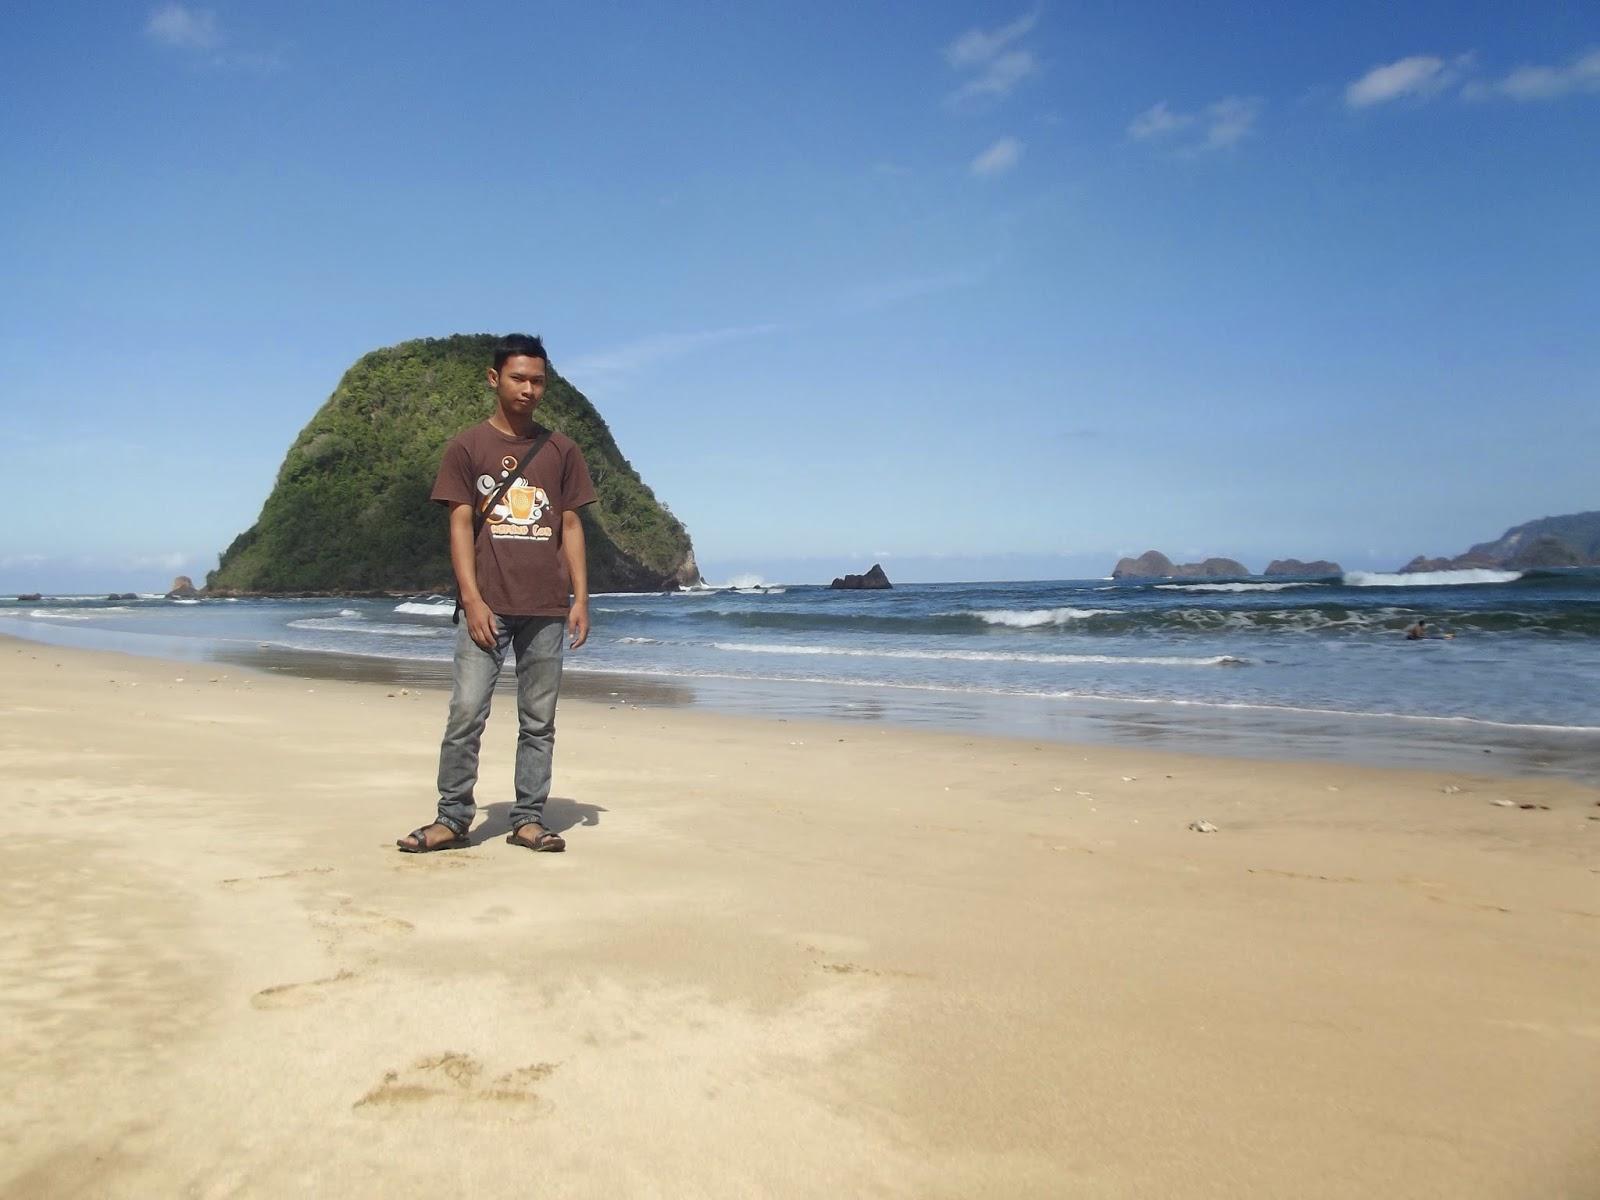 Pulau Merah